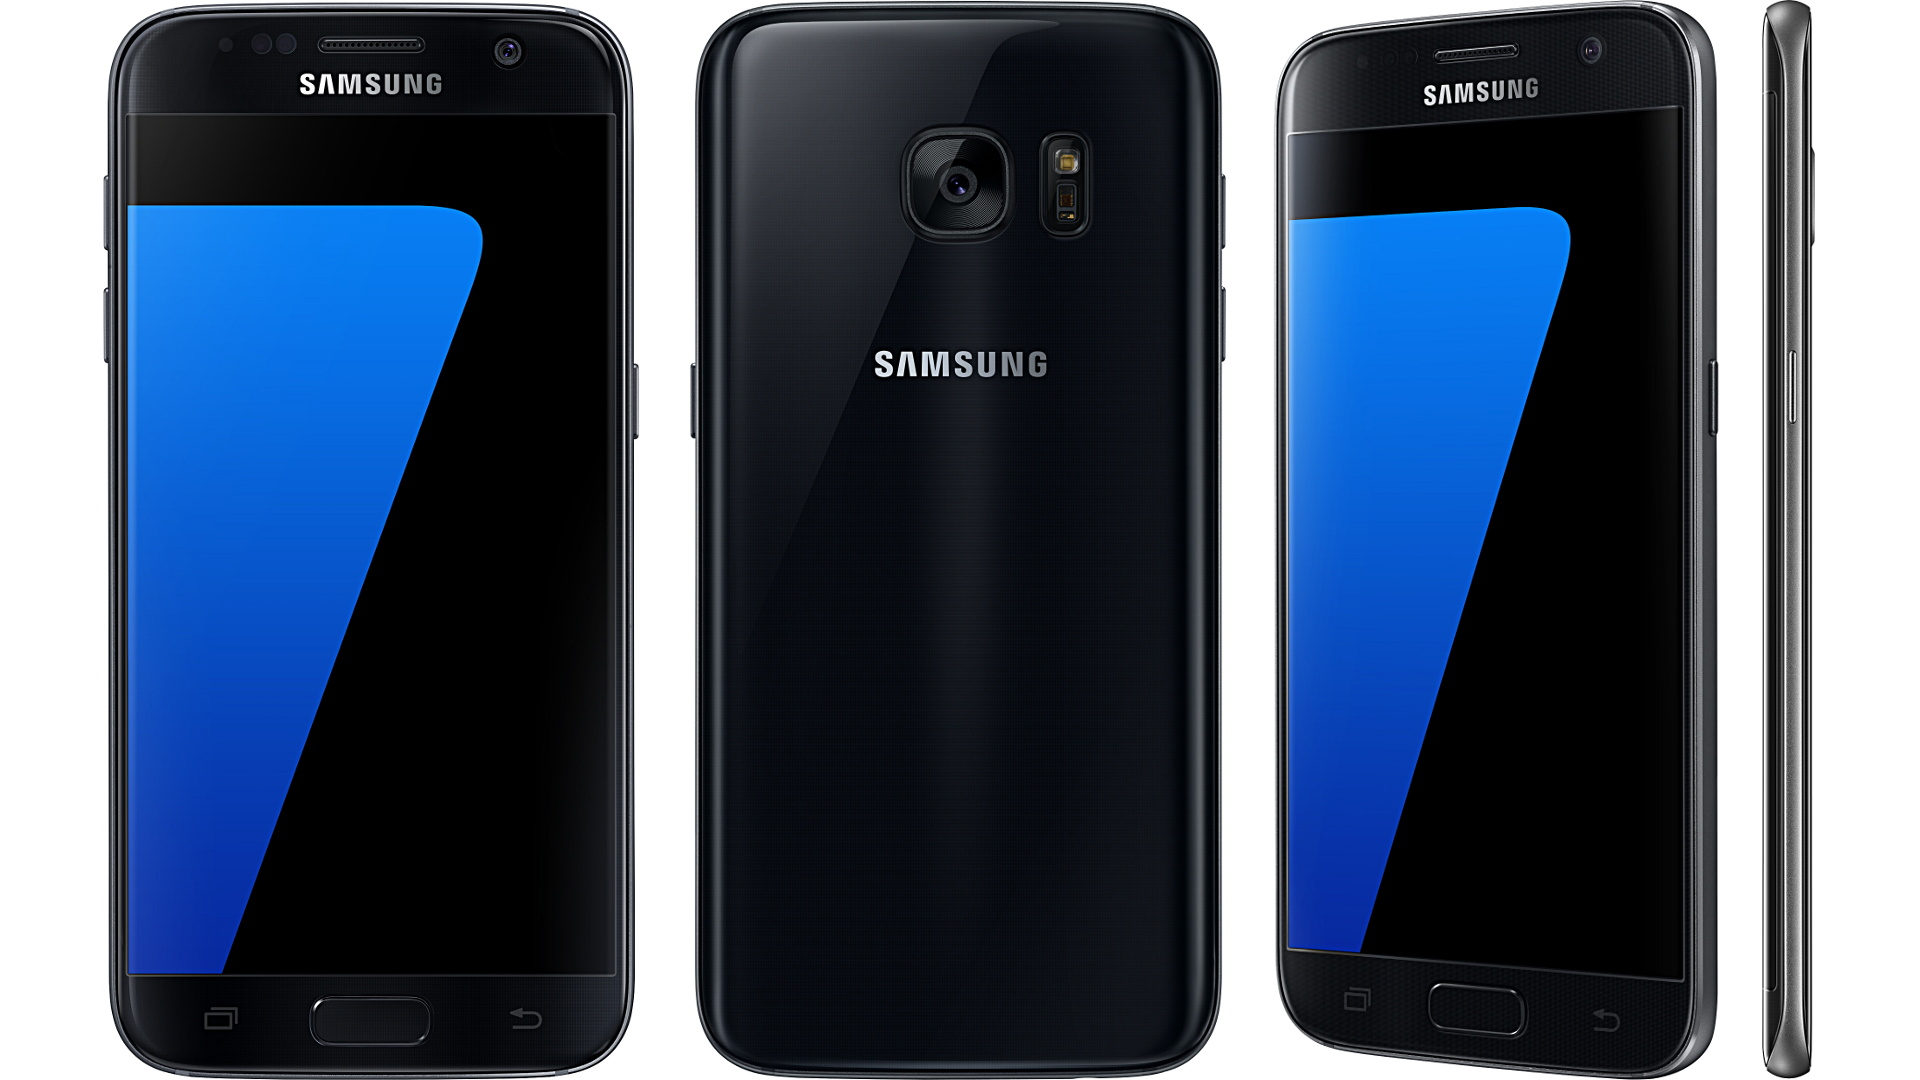 Samsung Galaxy S7 Edge ranking